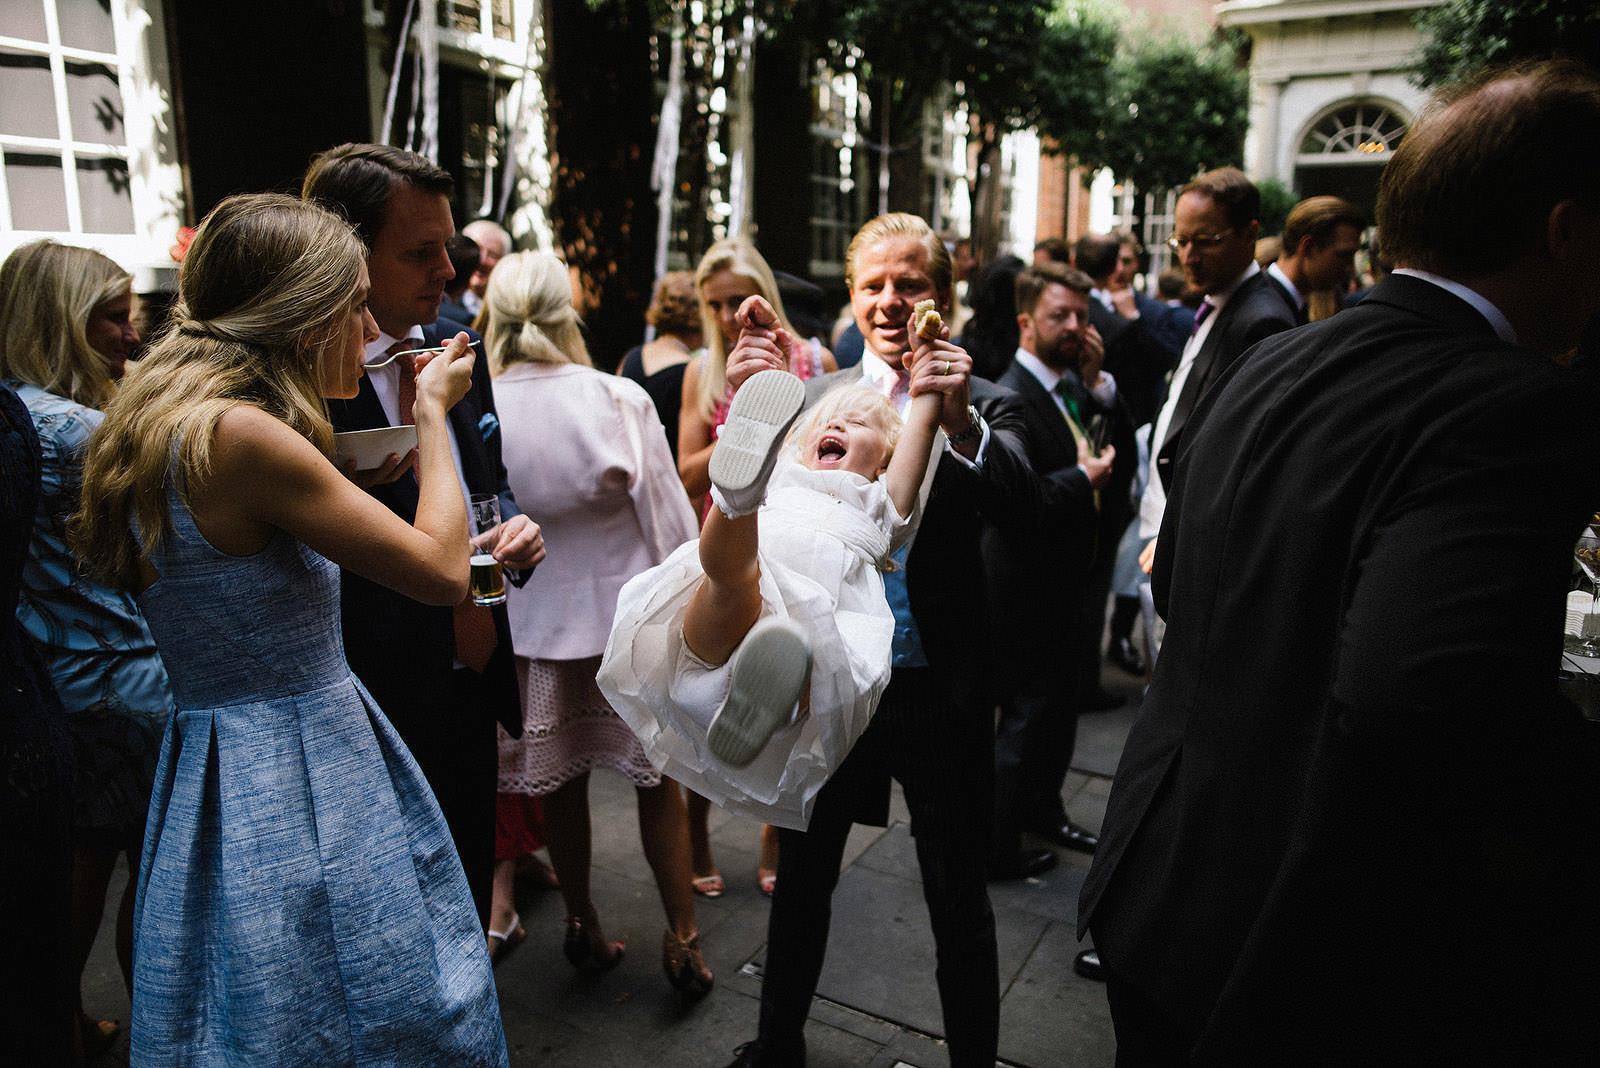 Fotograf Konstanz - Destination Wedding Photographer Amsterdam 073 - Destination Wedding Amsterdam  - 182 -